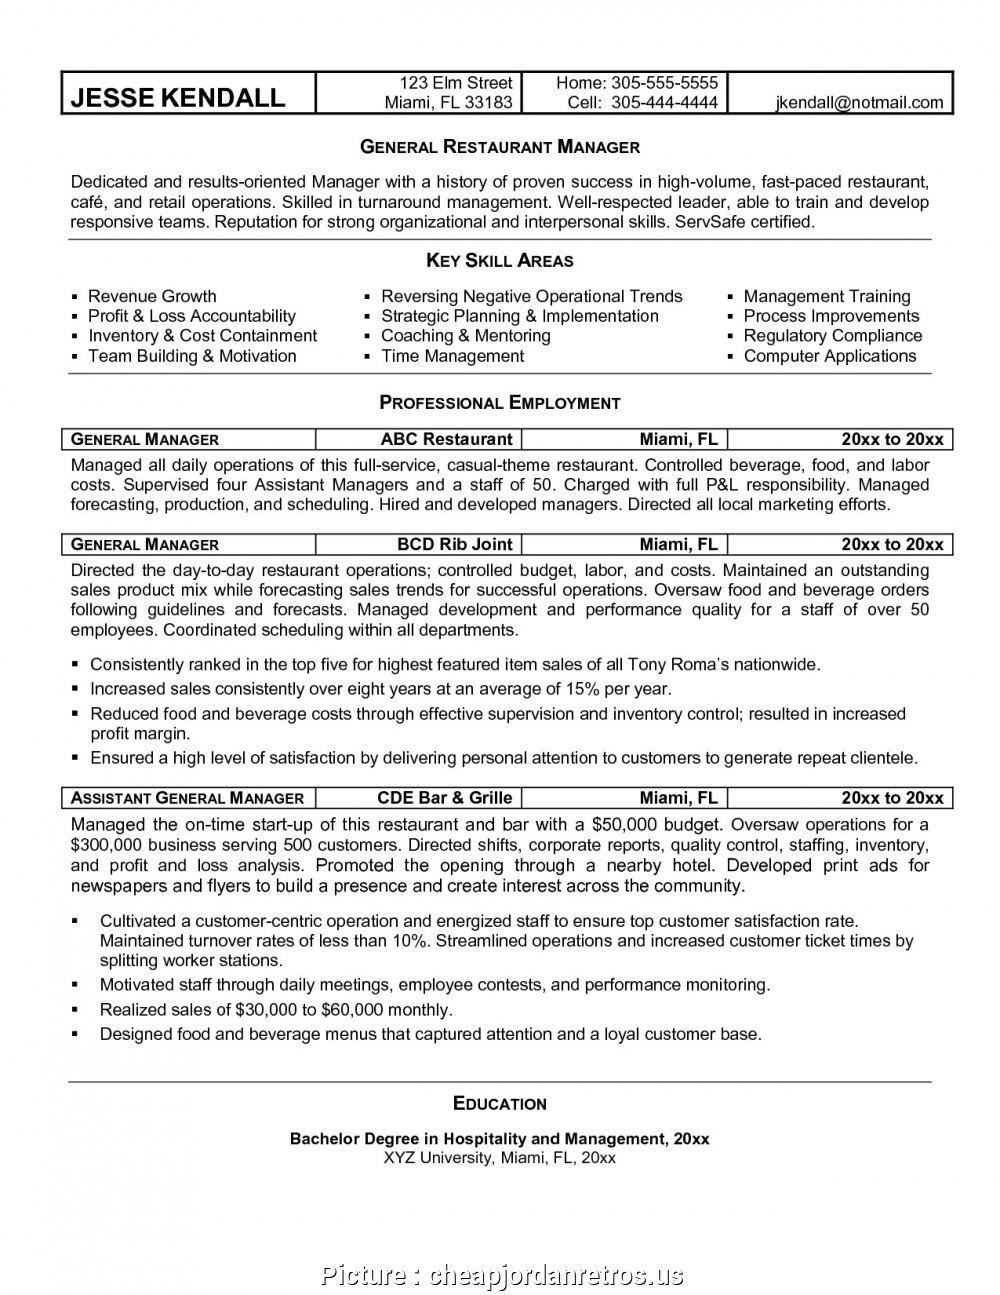 Hospitality Business Plan Template Restaurant Excele Resume Pertaining To University Of Miami Powerp Custom Essay Writing Service Resume Examples Server Resume